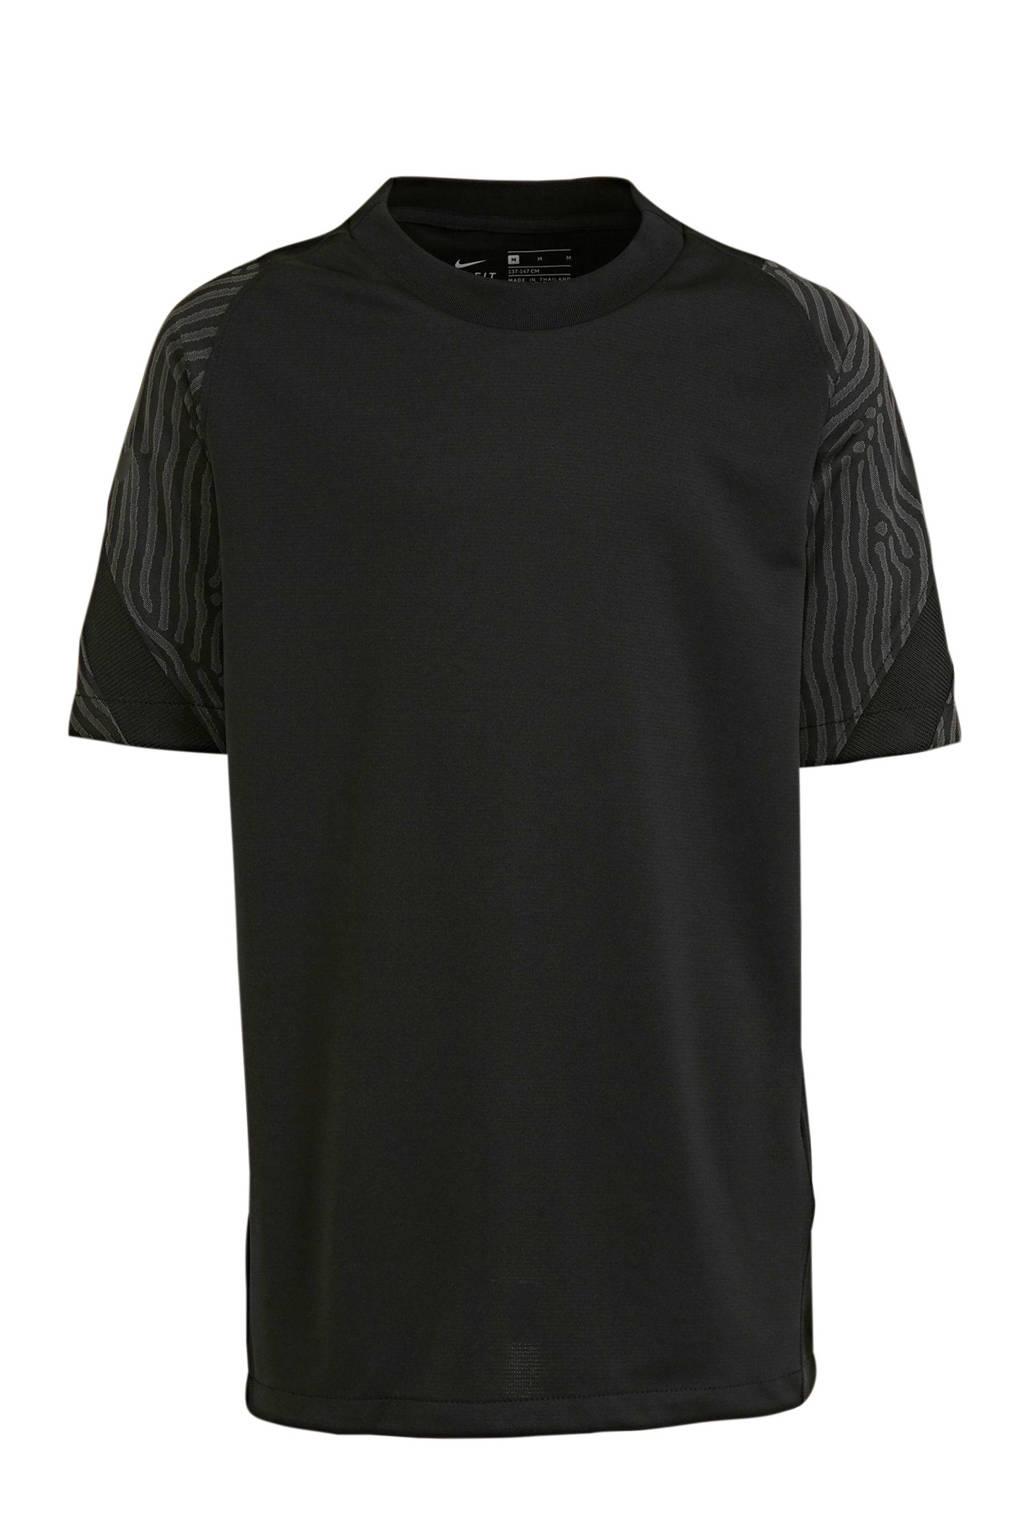 Nike Junior  Voetbalshirt zwart/antraciet, Zwart/antraciet